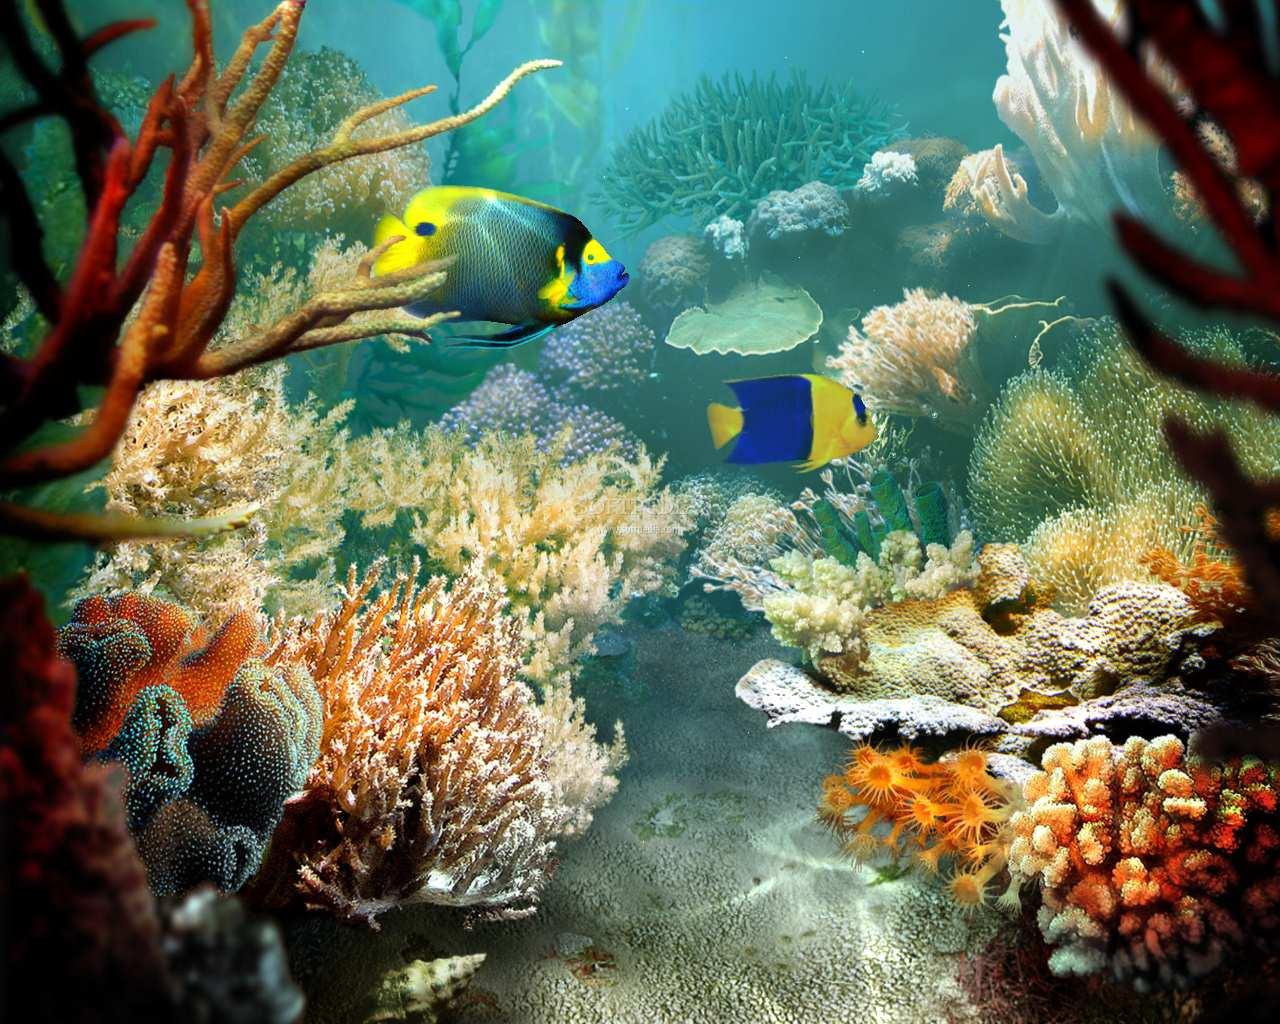 tropical fish screensaver tropical fish pic tropical fish photo